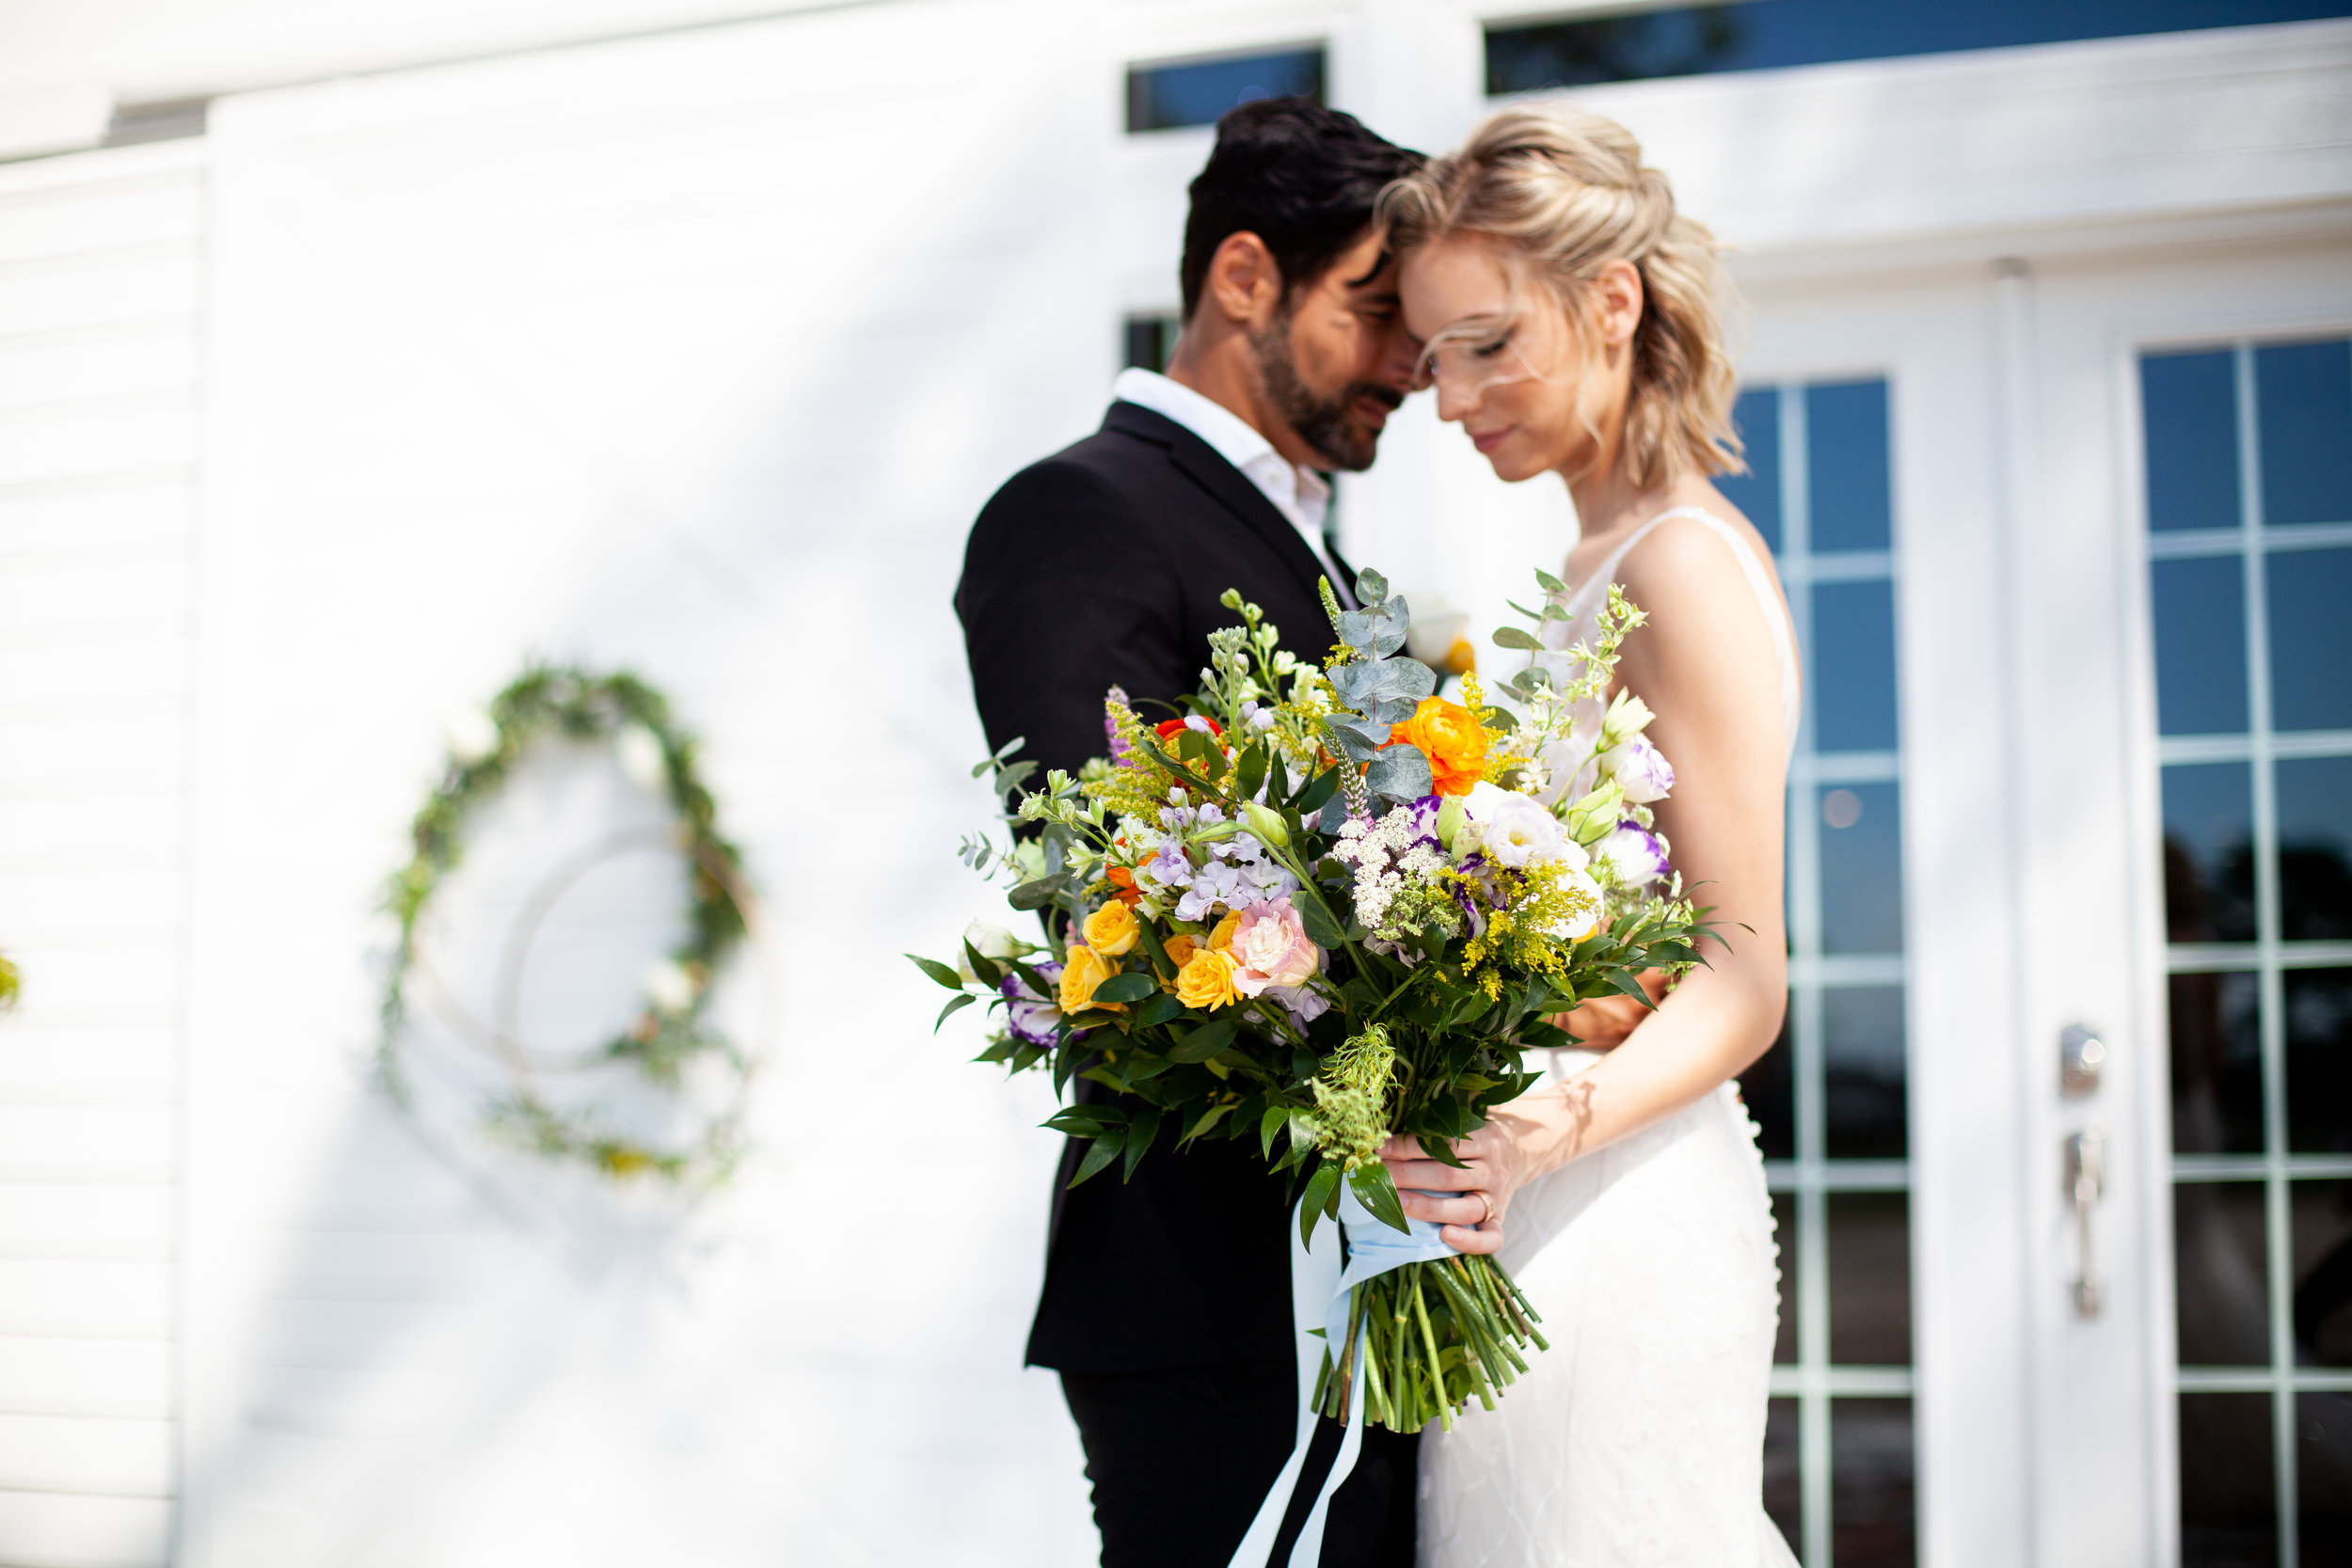 kelilina photography and films florida wedding photography videography 005-5.jpg